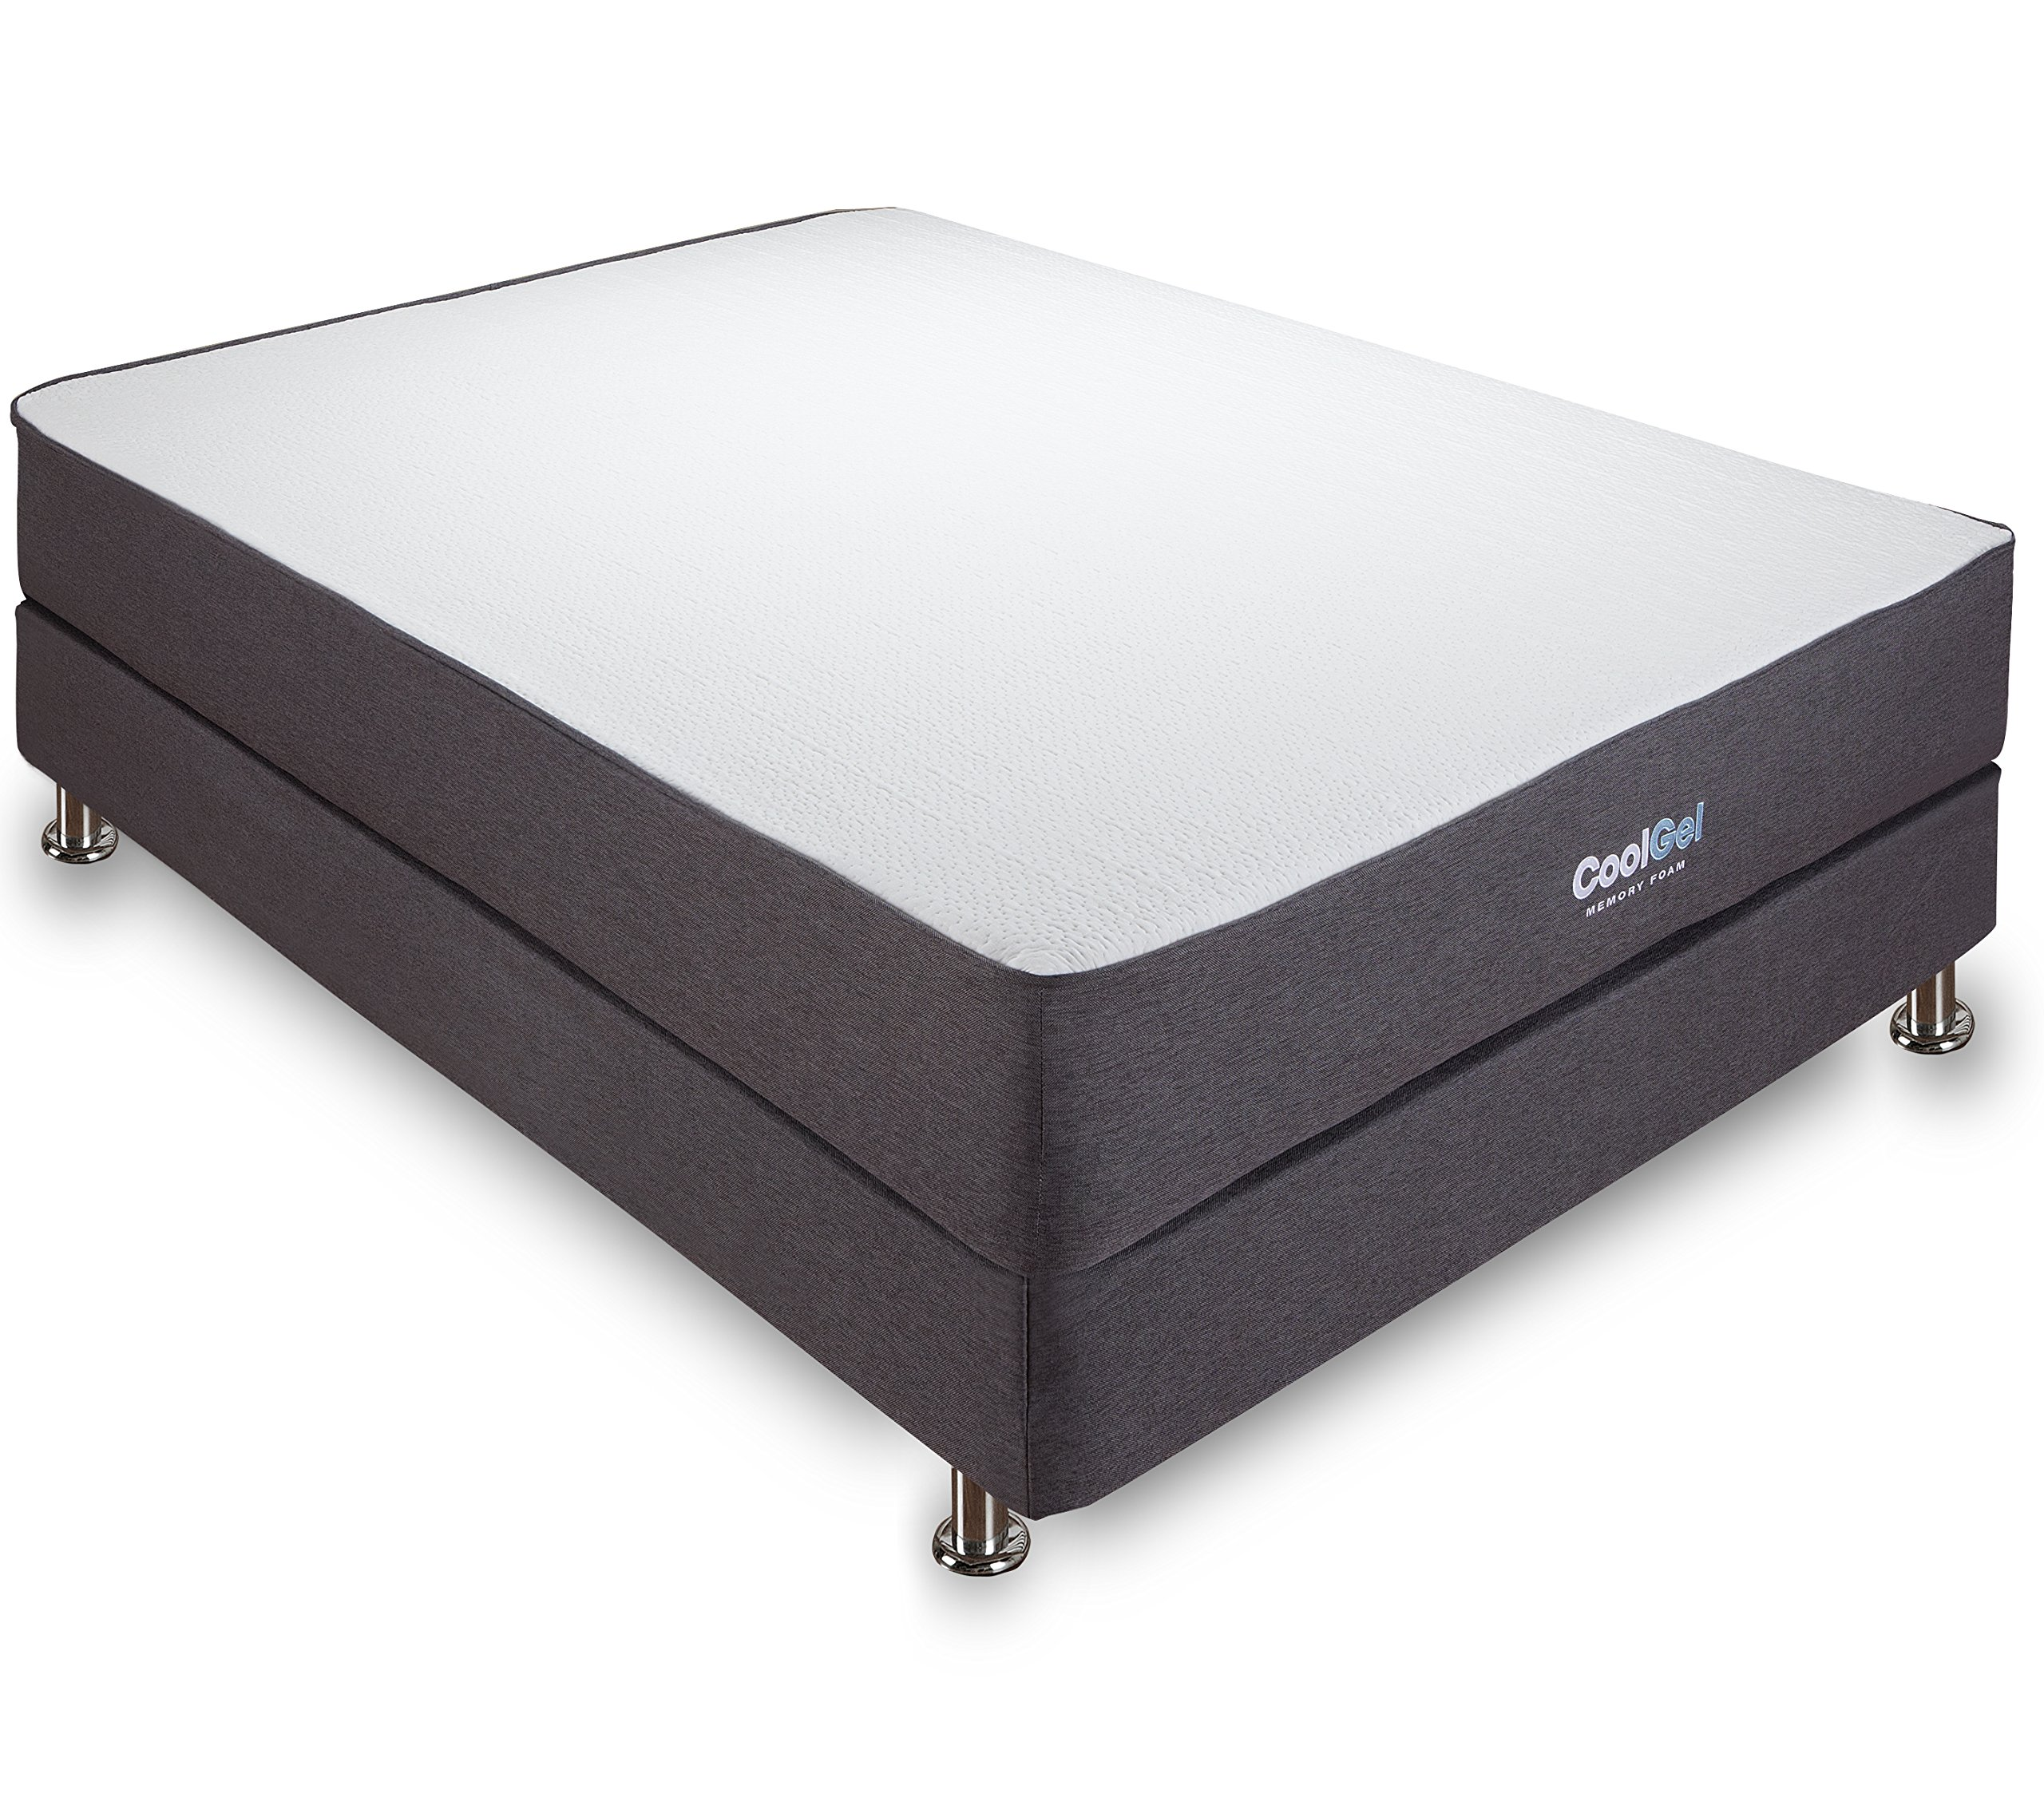 classic brands 10 5 inch cool gel ventilated memory foam mattress queen ebay. Black Bedroom Furniture Sets. Home Design Ideas